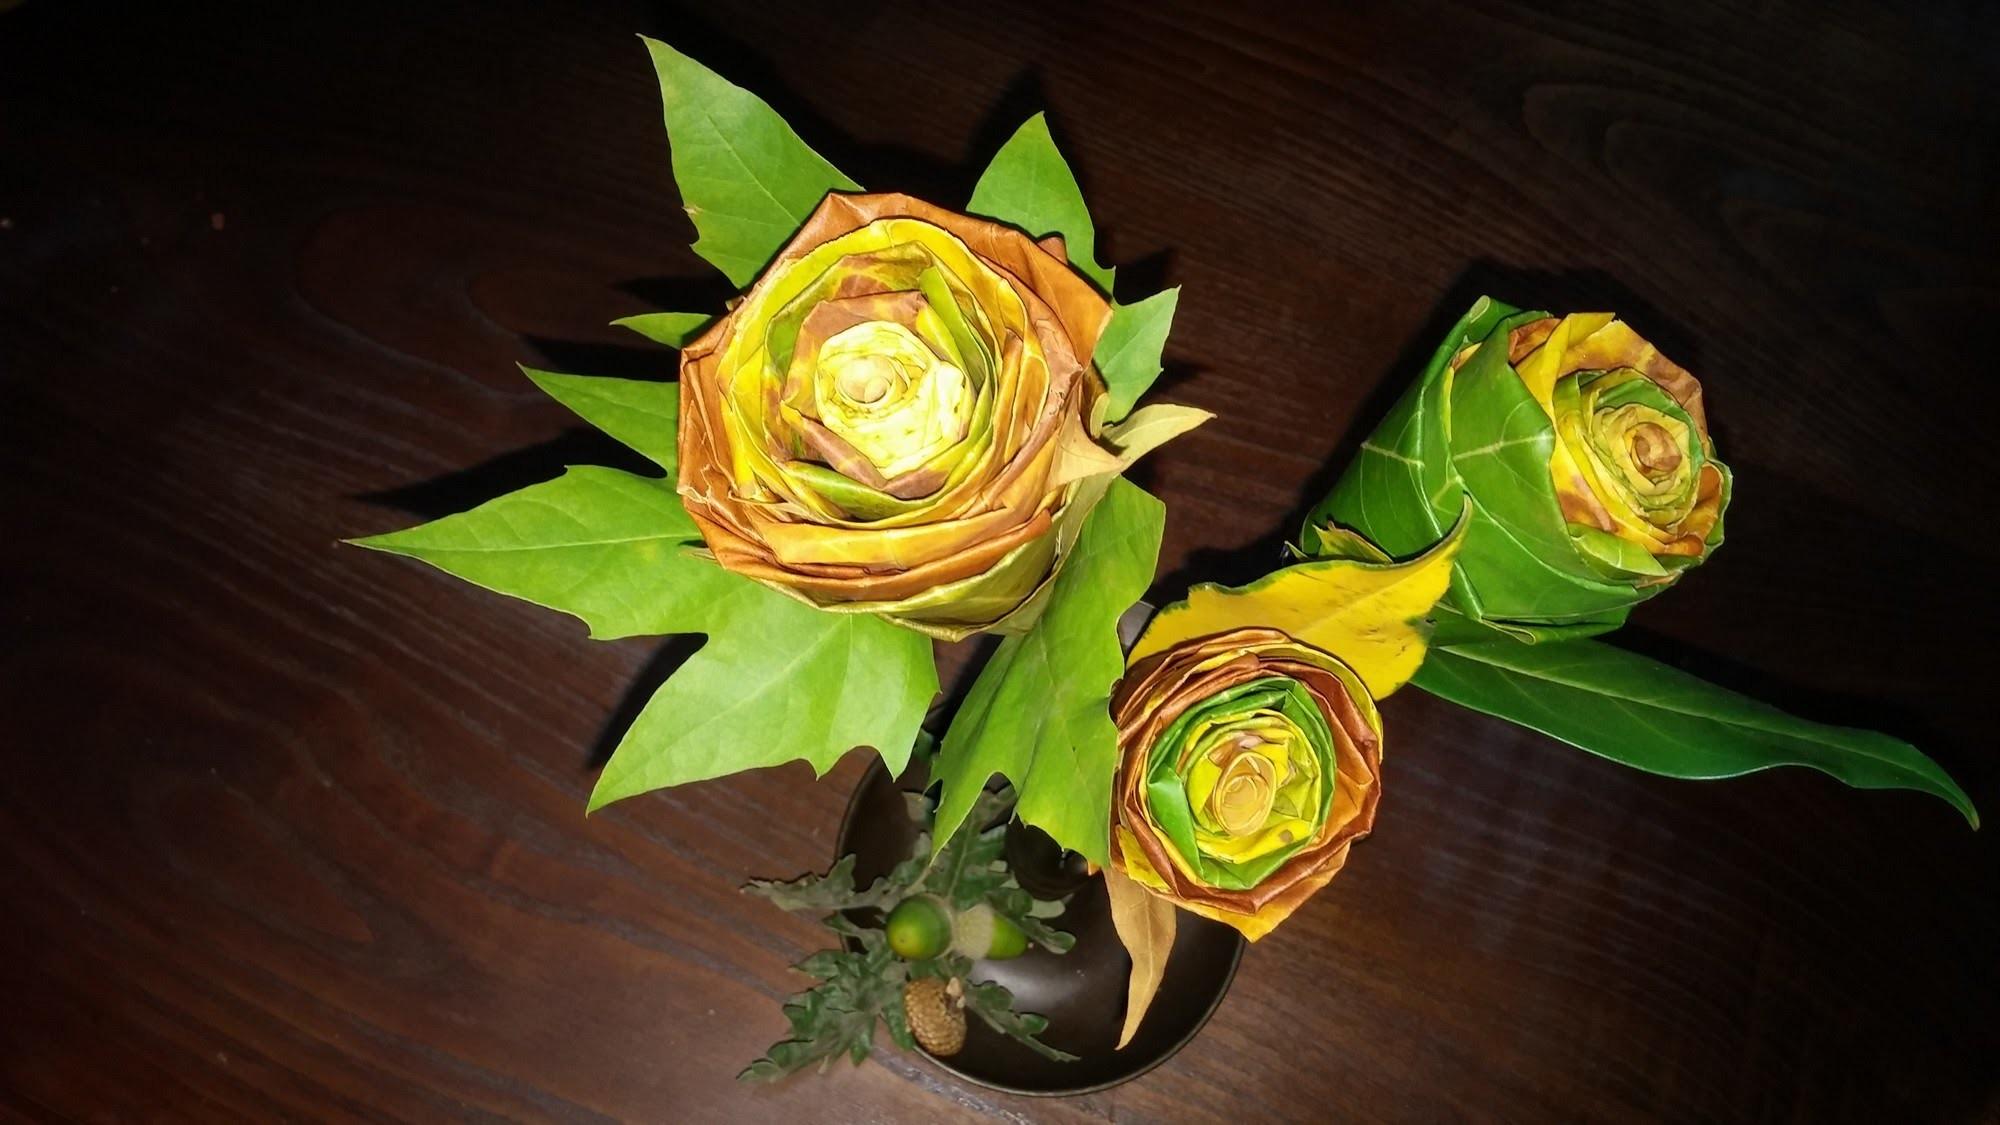 Flores de folhas secas - DIY - Flowers from dried leaves